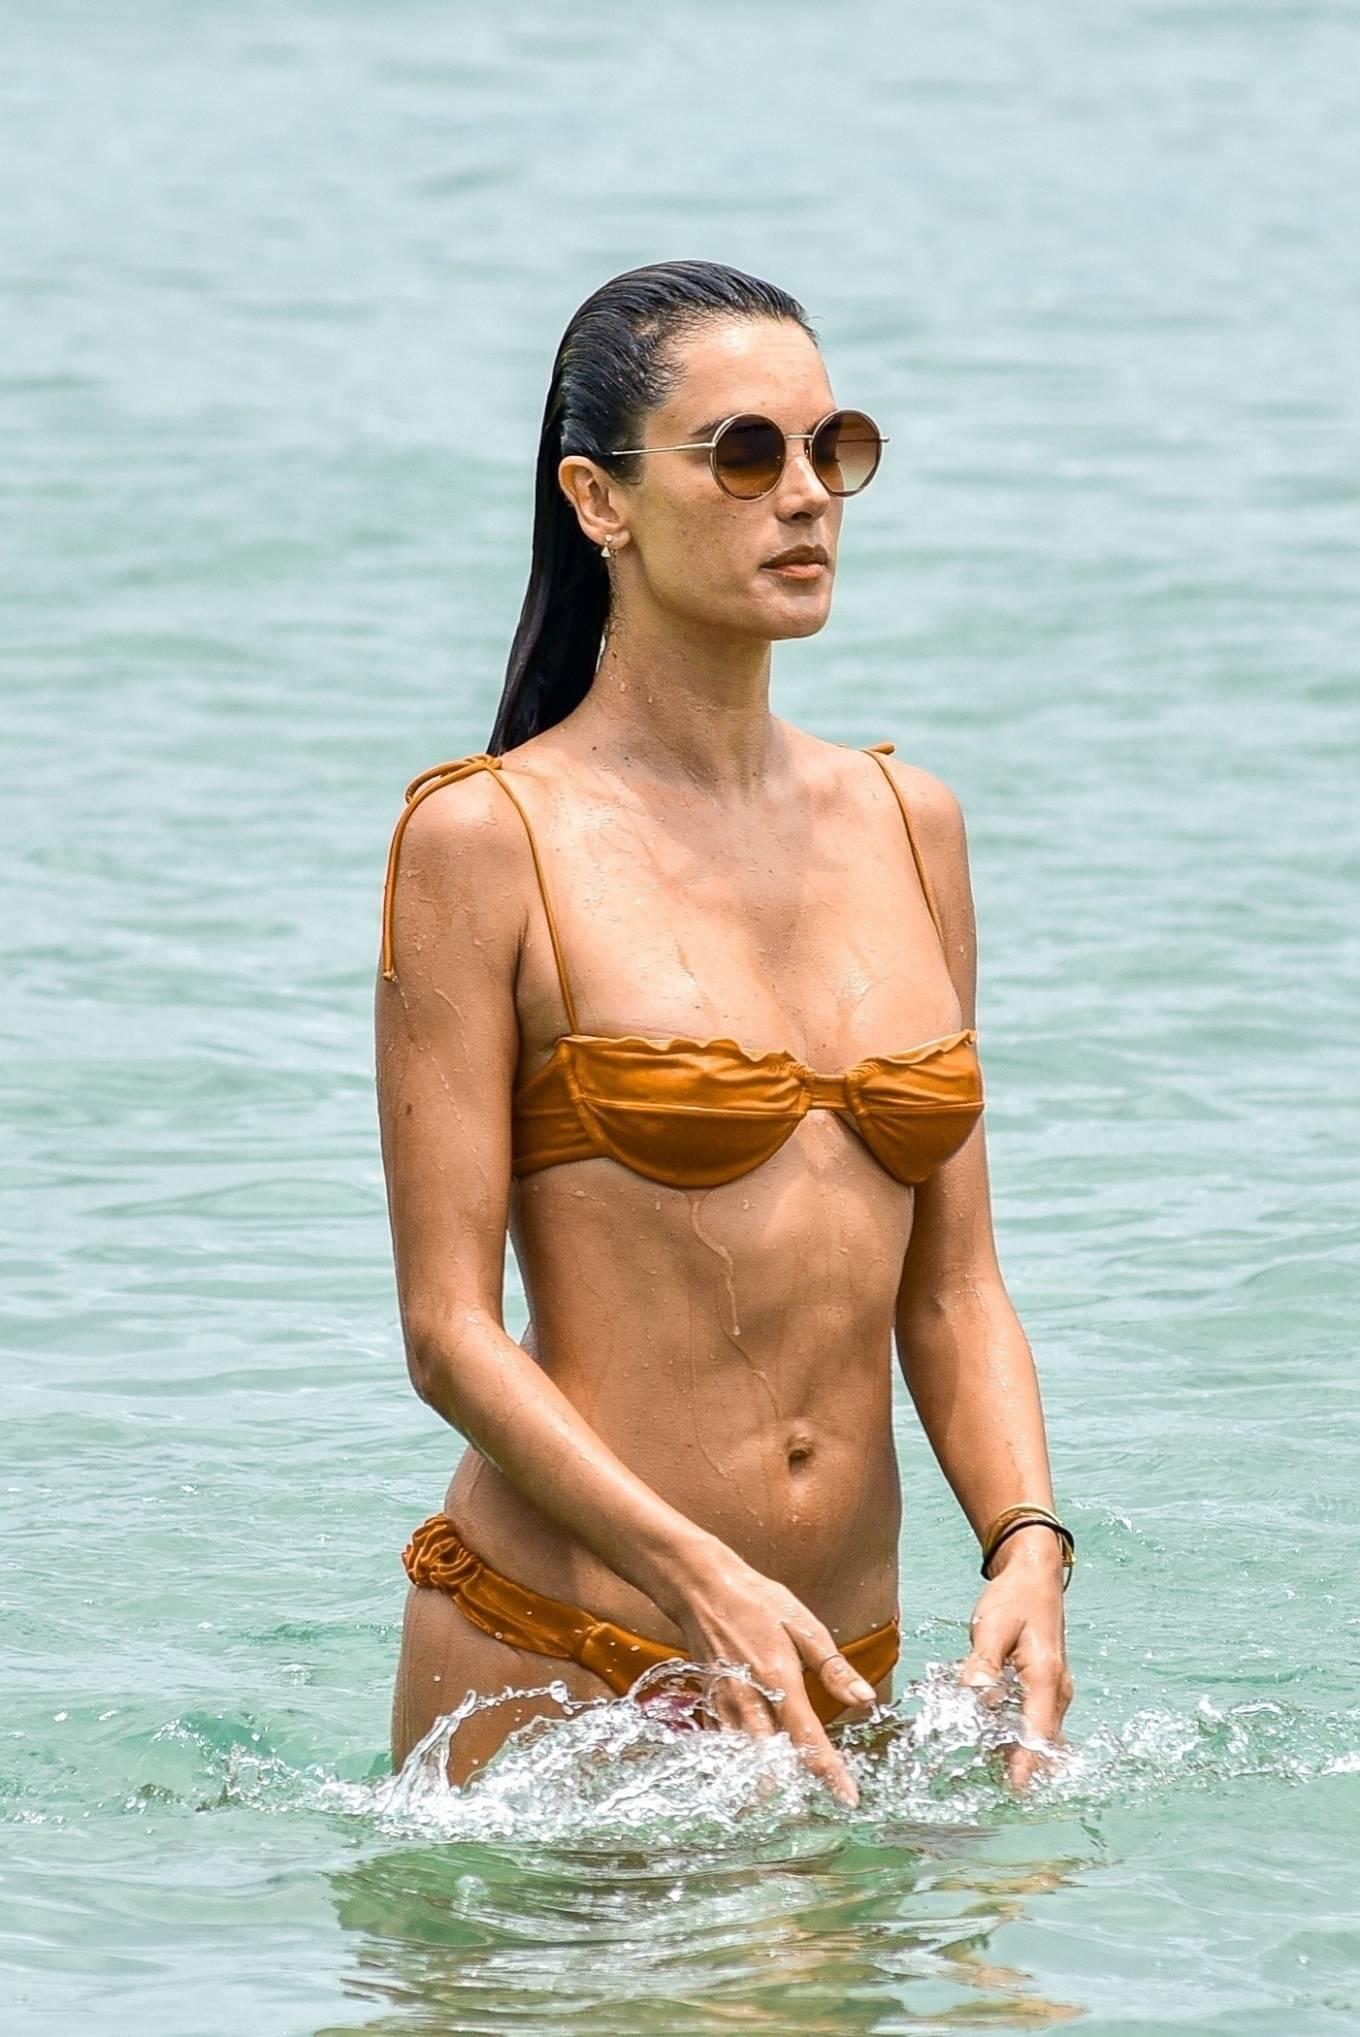 Alessandra Ambrosio - In a bikini enjoying her vacation in Brazil